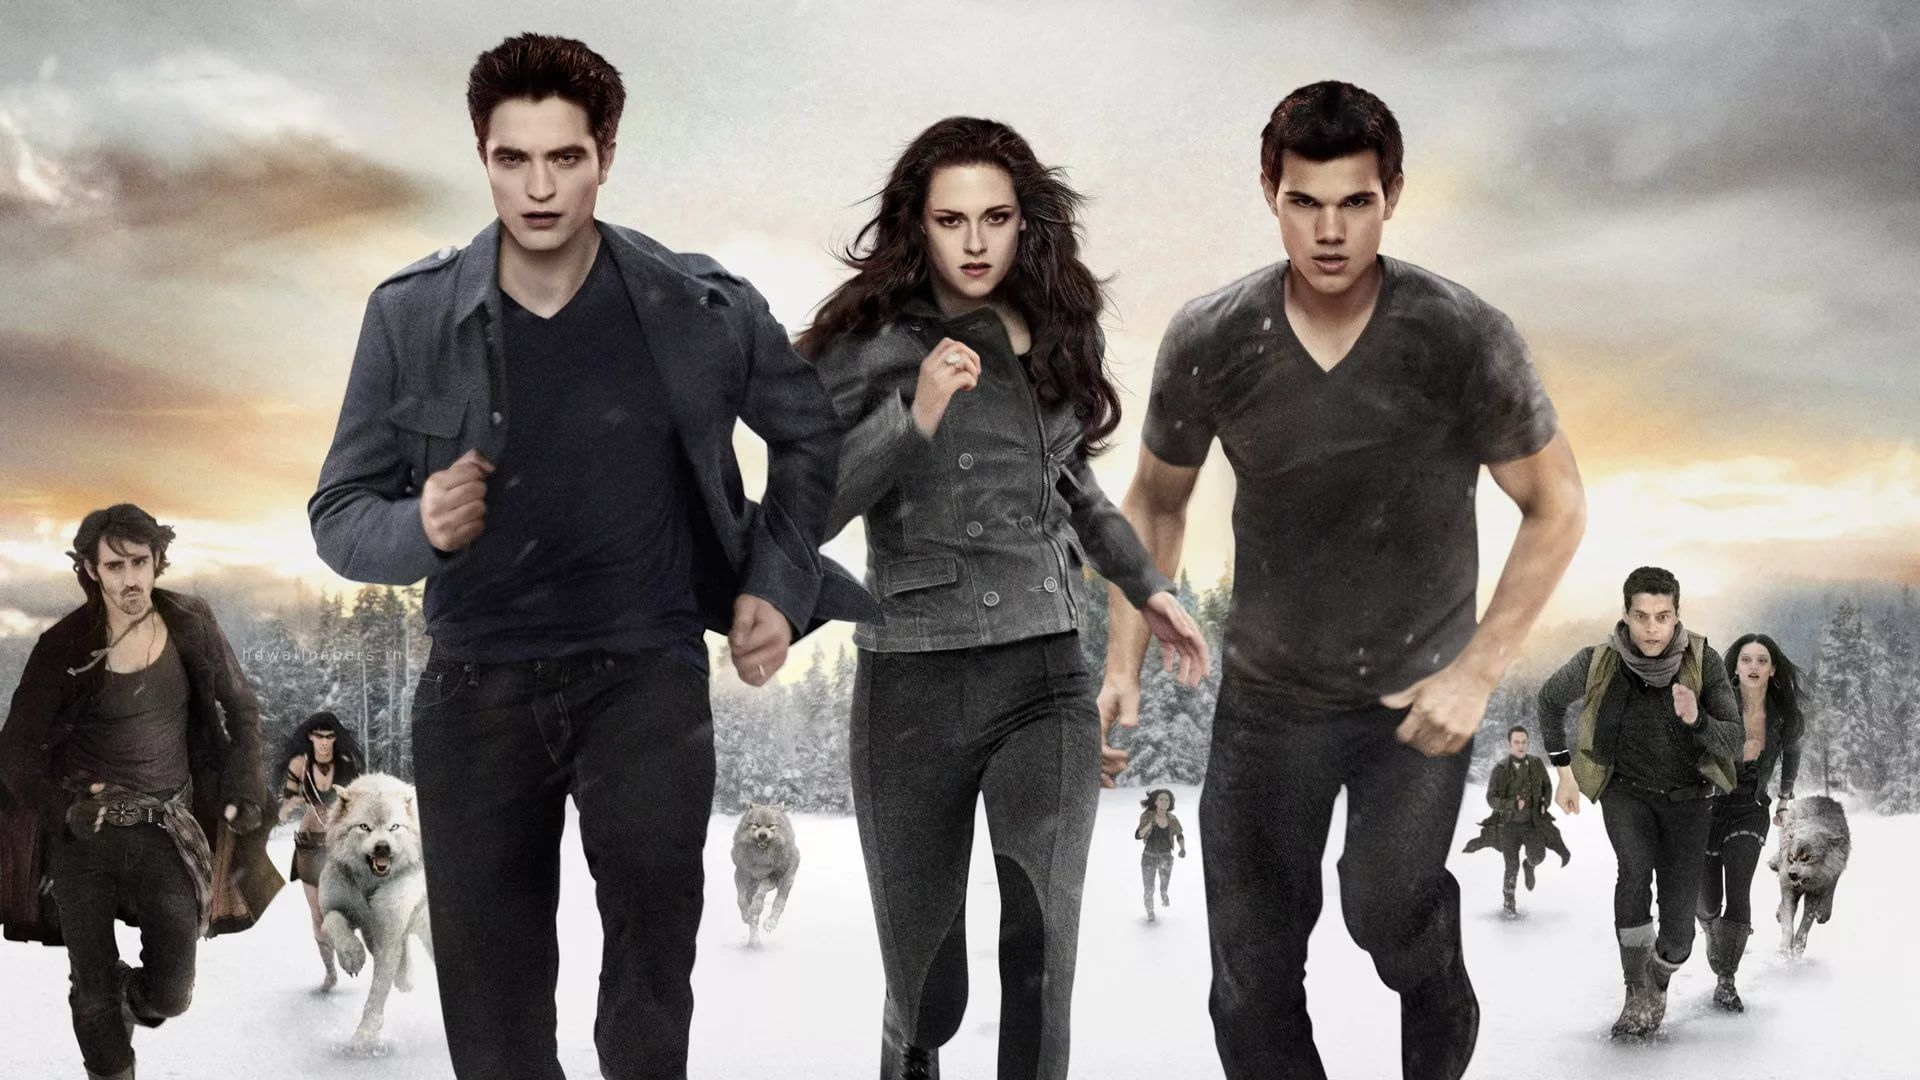 Twilight Saga wallpaper picture hd